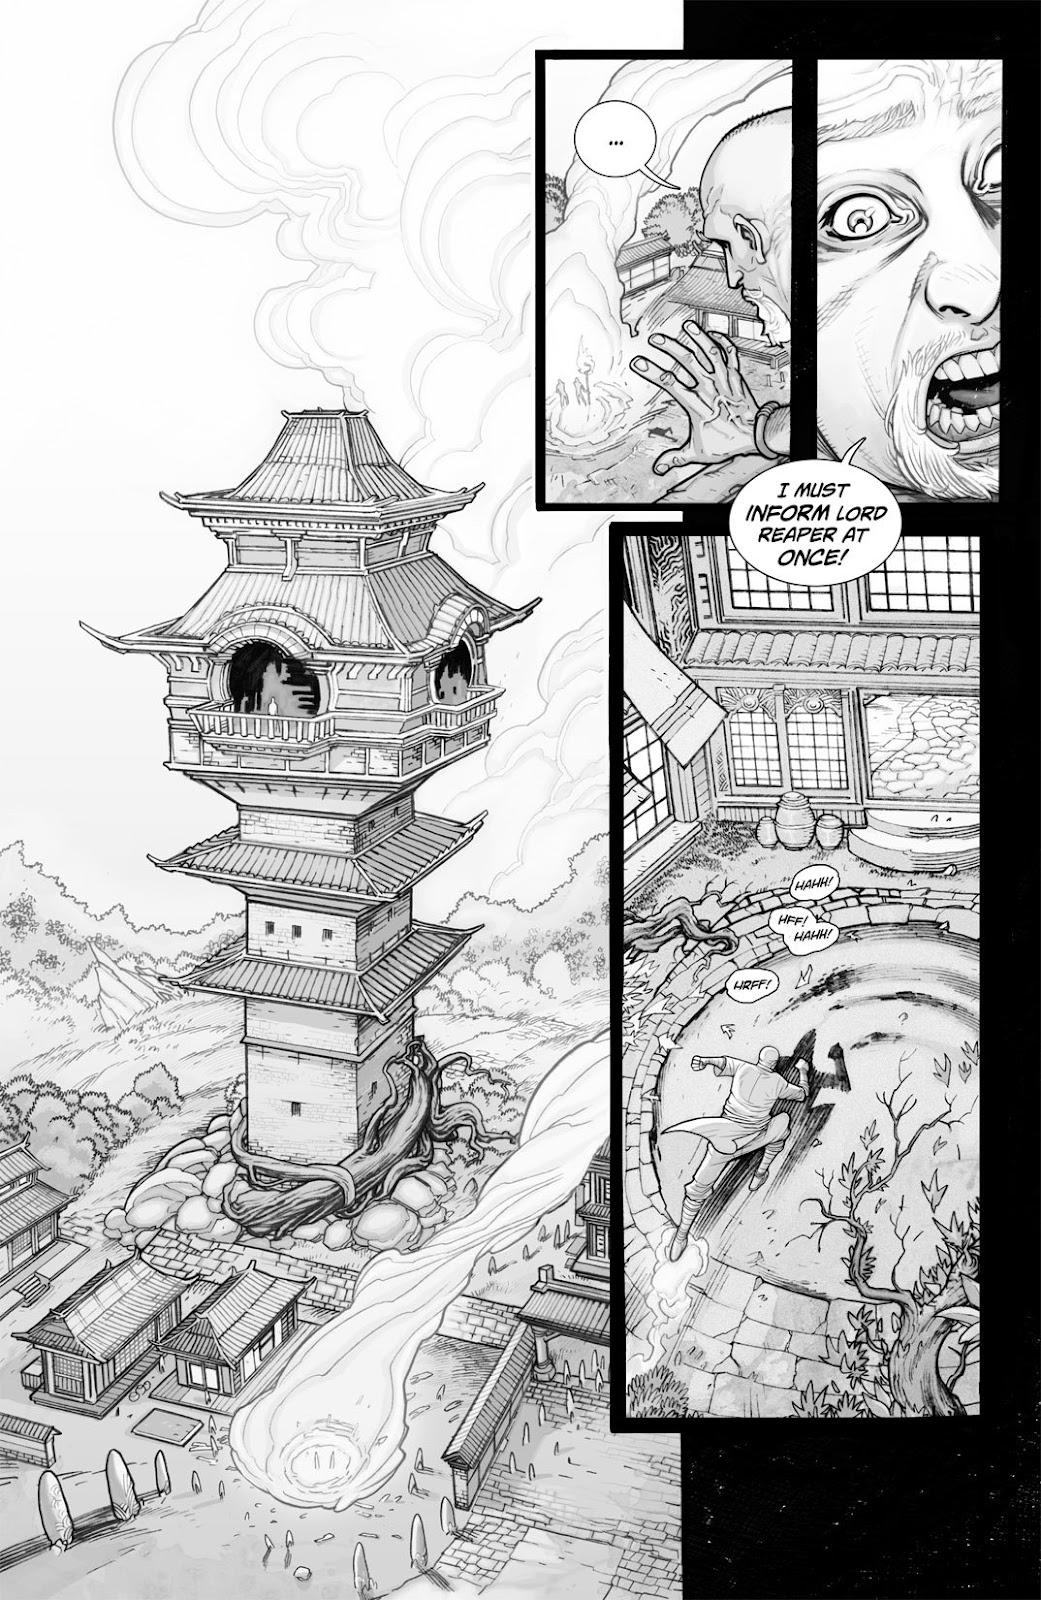 Read online Reaper comic -  Issue #2 - 16